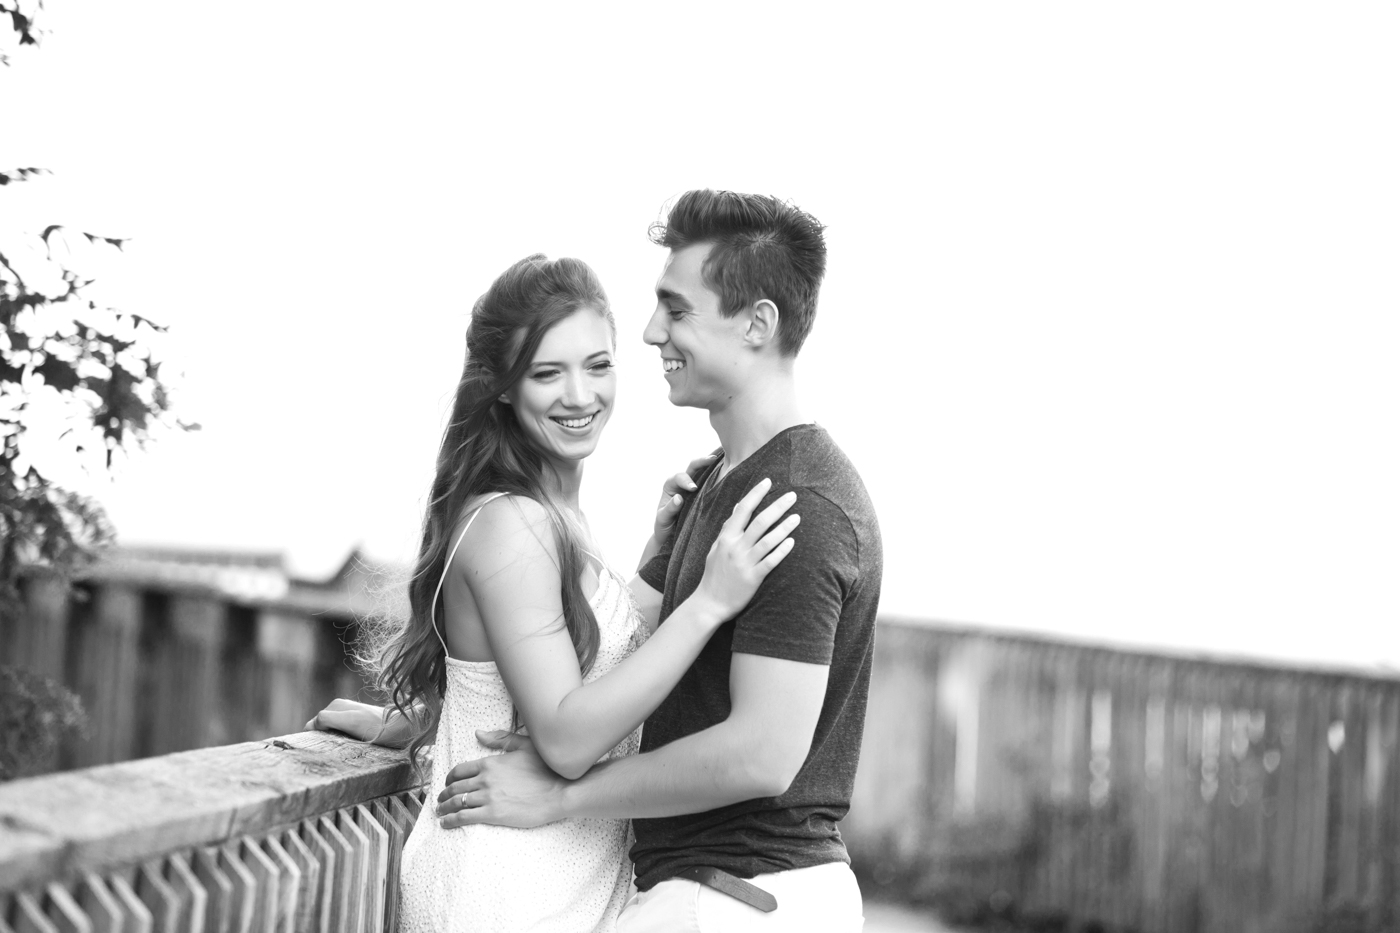 summer-beach-engagement-shoot-ksenia-pro-photography-1